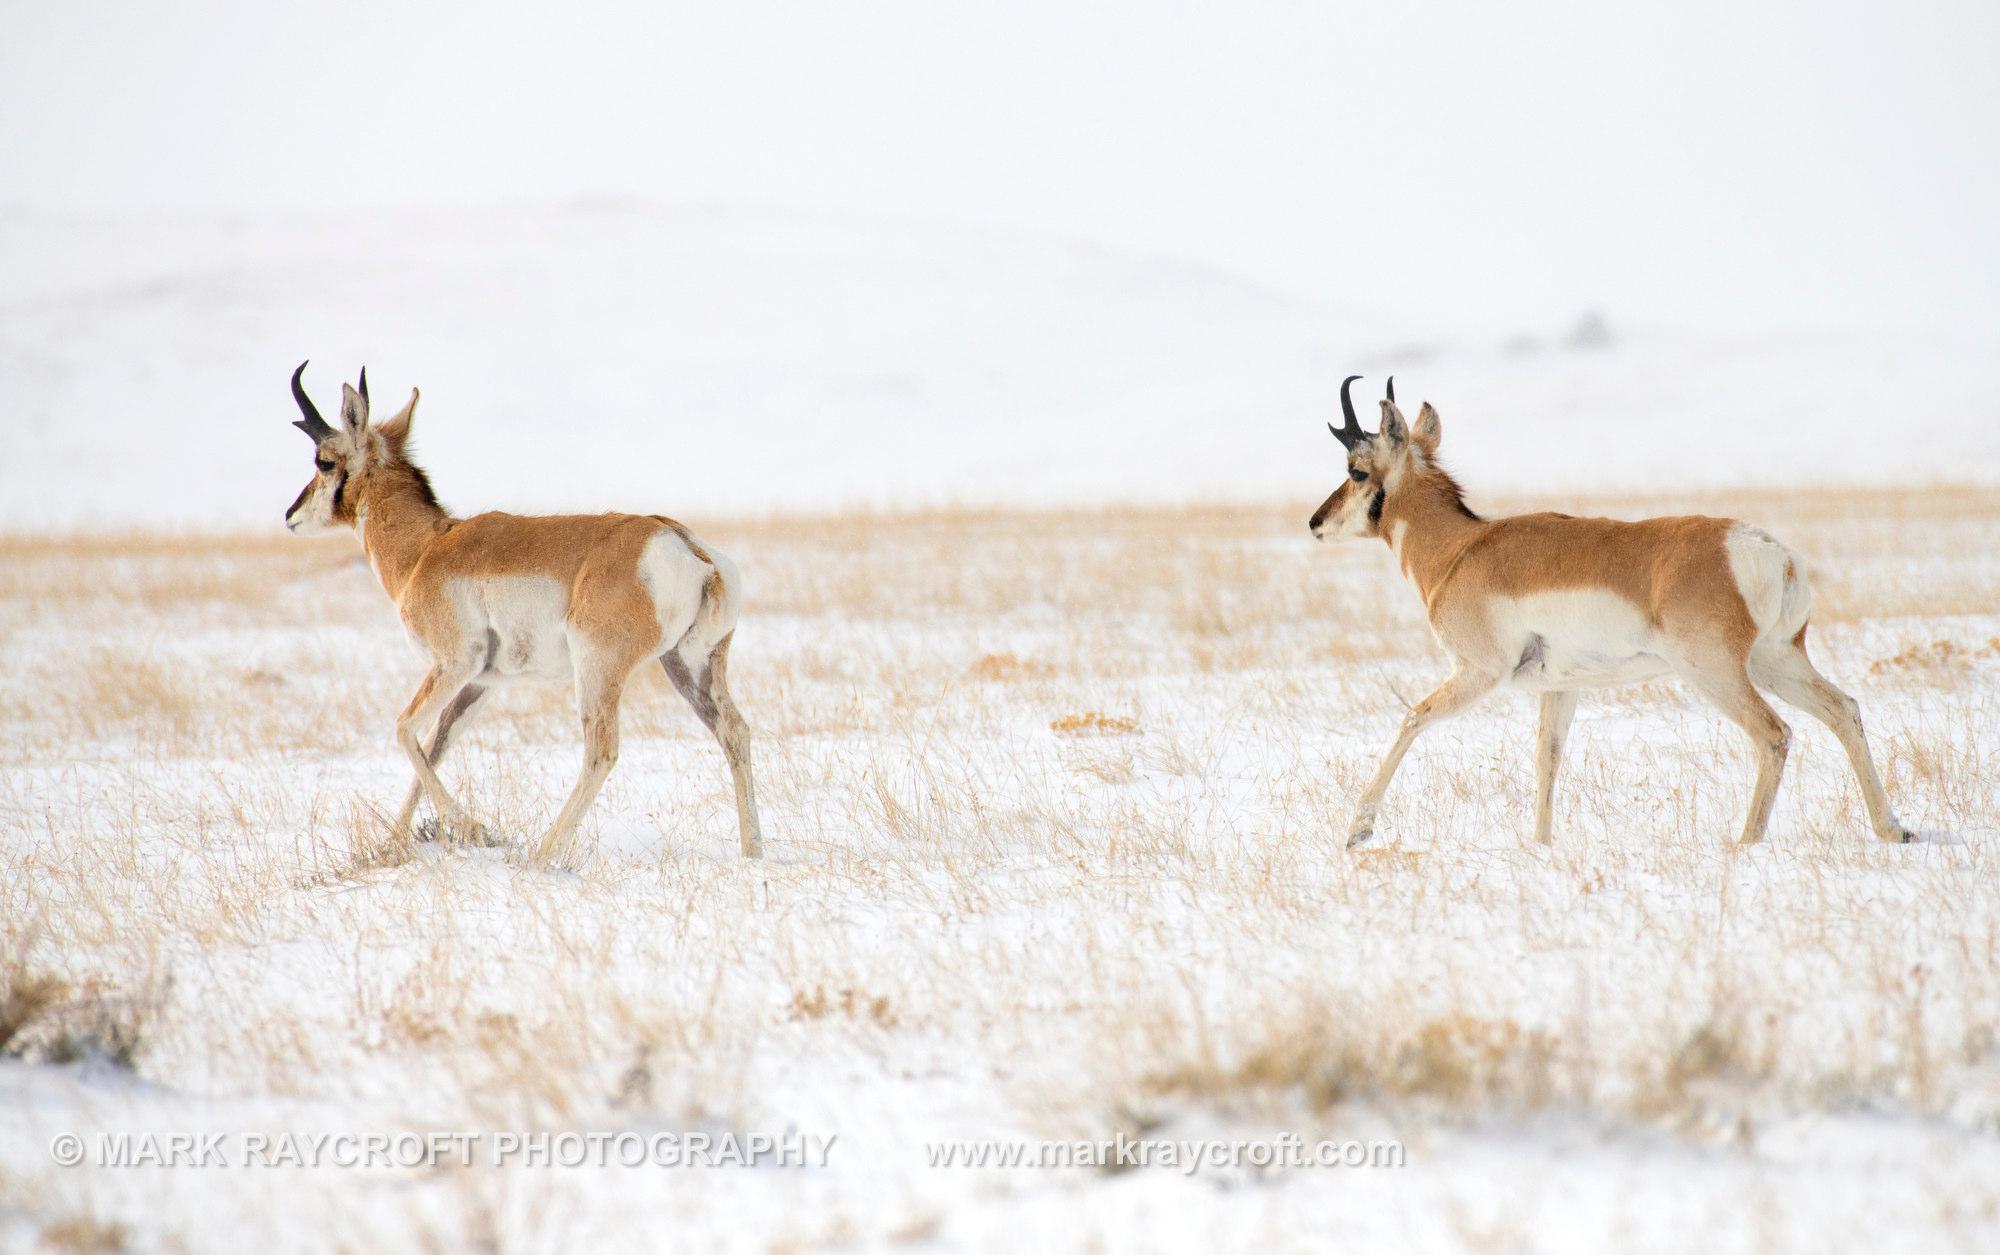 PH024_Pronghorn_Antelope_Mark_Raycroft.JPG